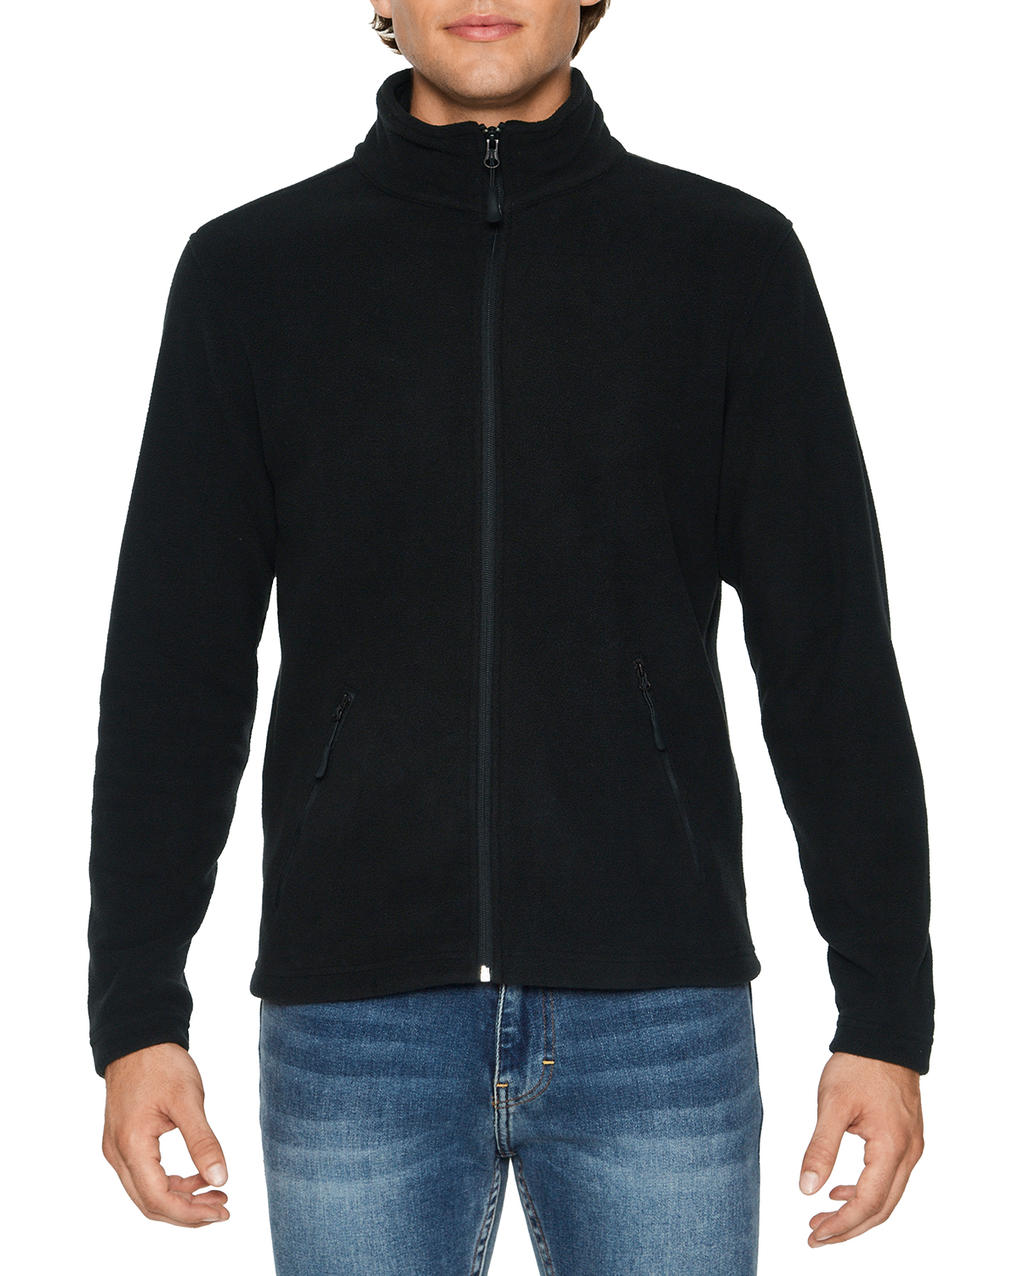 Hammer™ Unisex Micro-Fleece Jacket